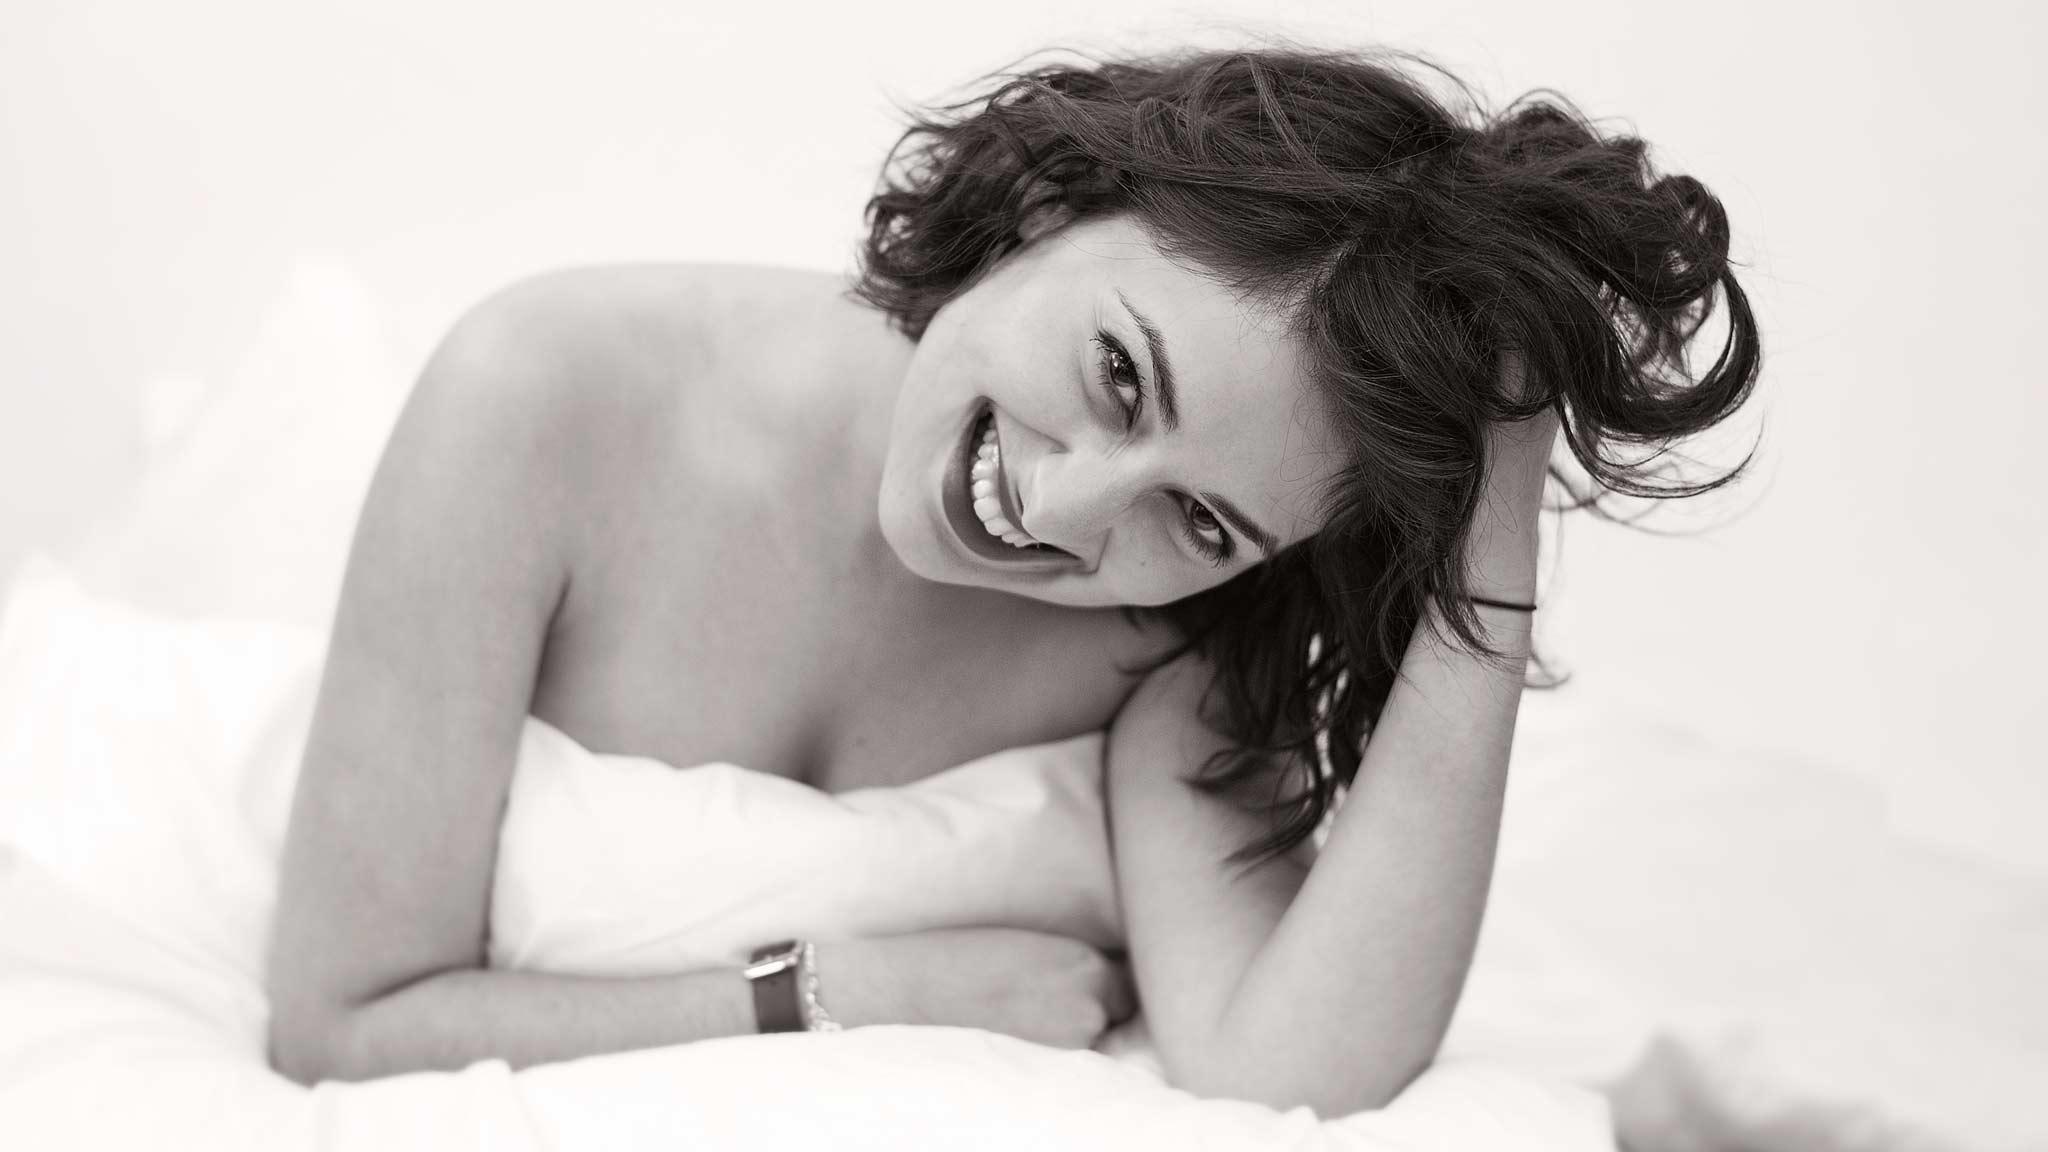 photographe-portrait-glamour-lingerie-nb-noir-et-blanc-bw